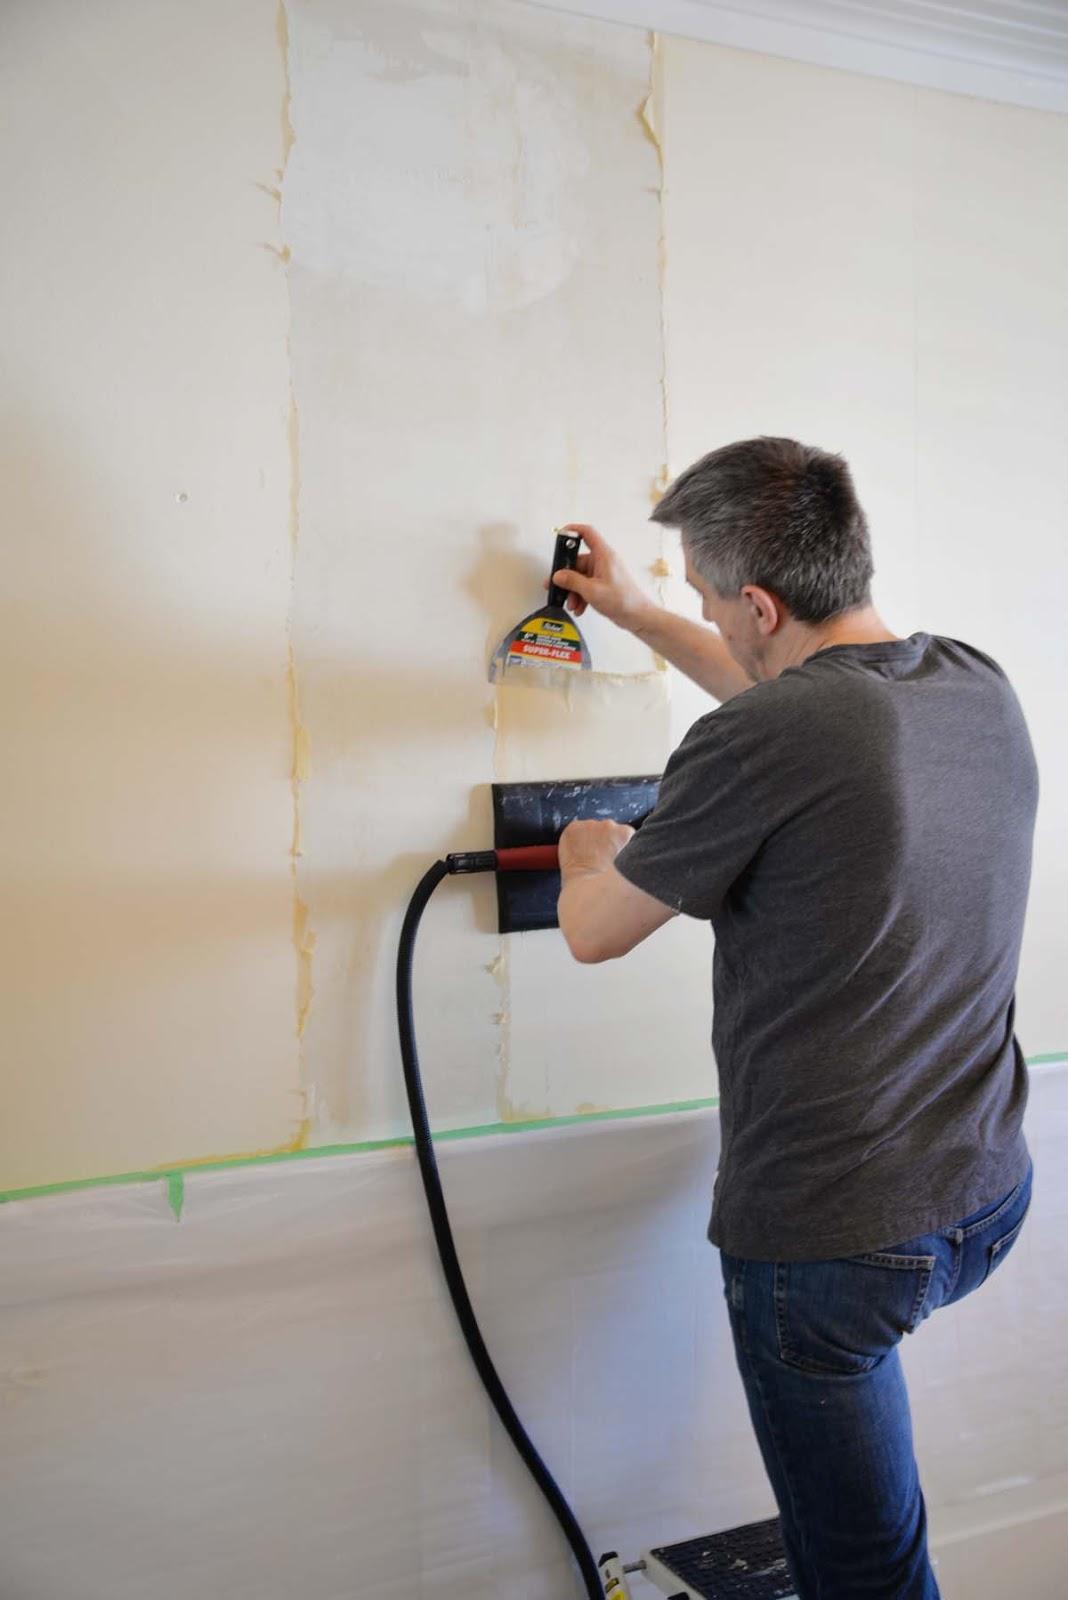 wallpaper removal, wallpaper steamer, removing wallpaper